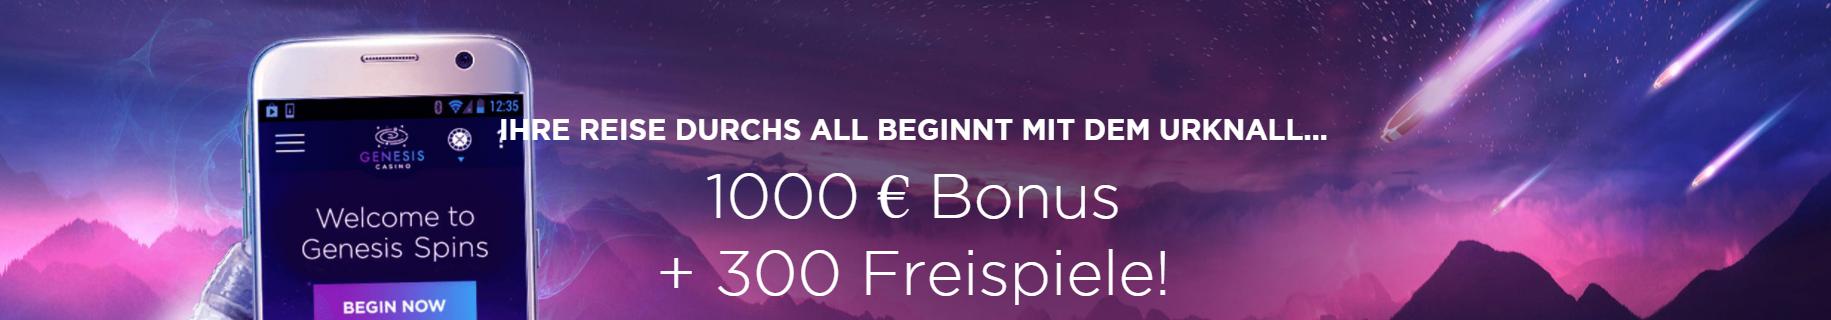 genesis spins willkommens bonus